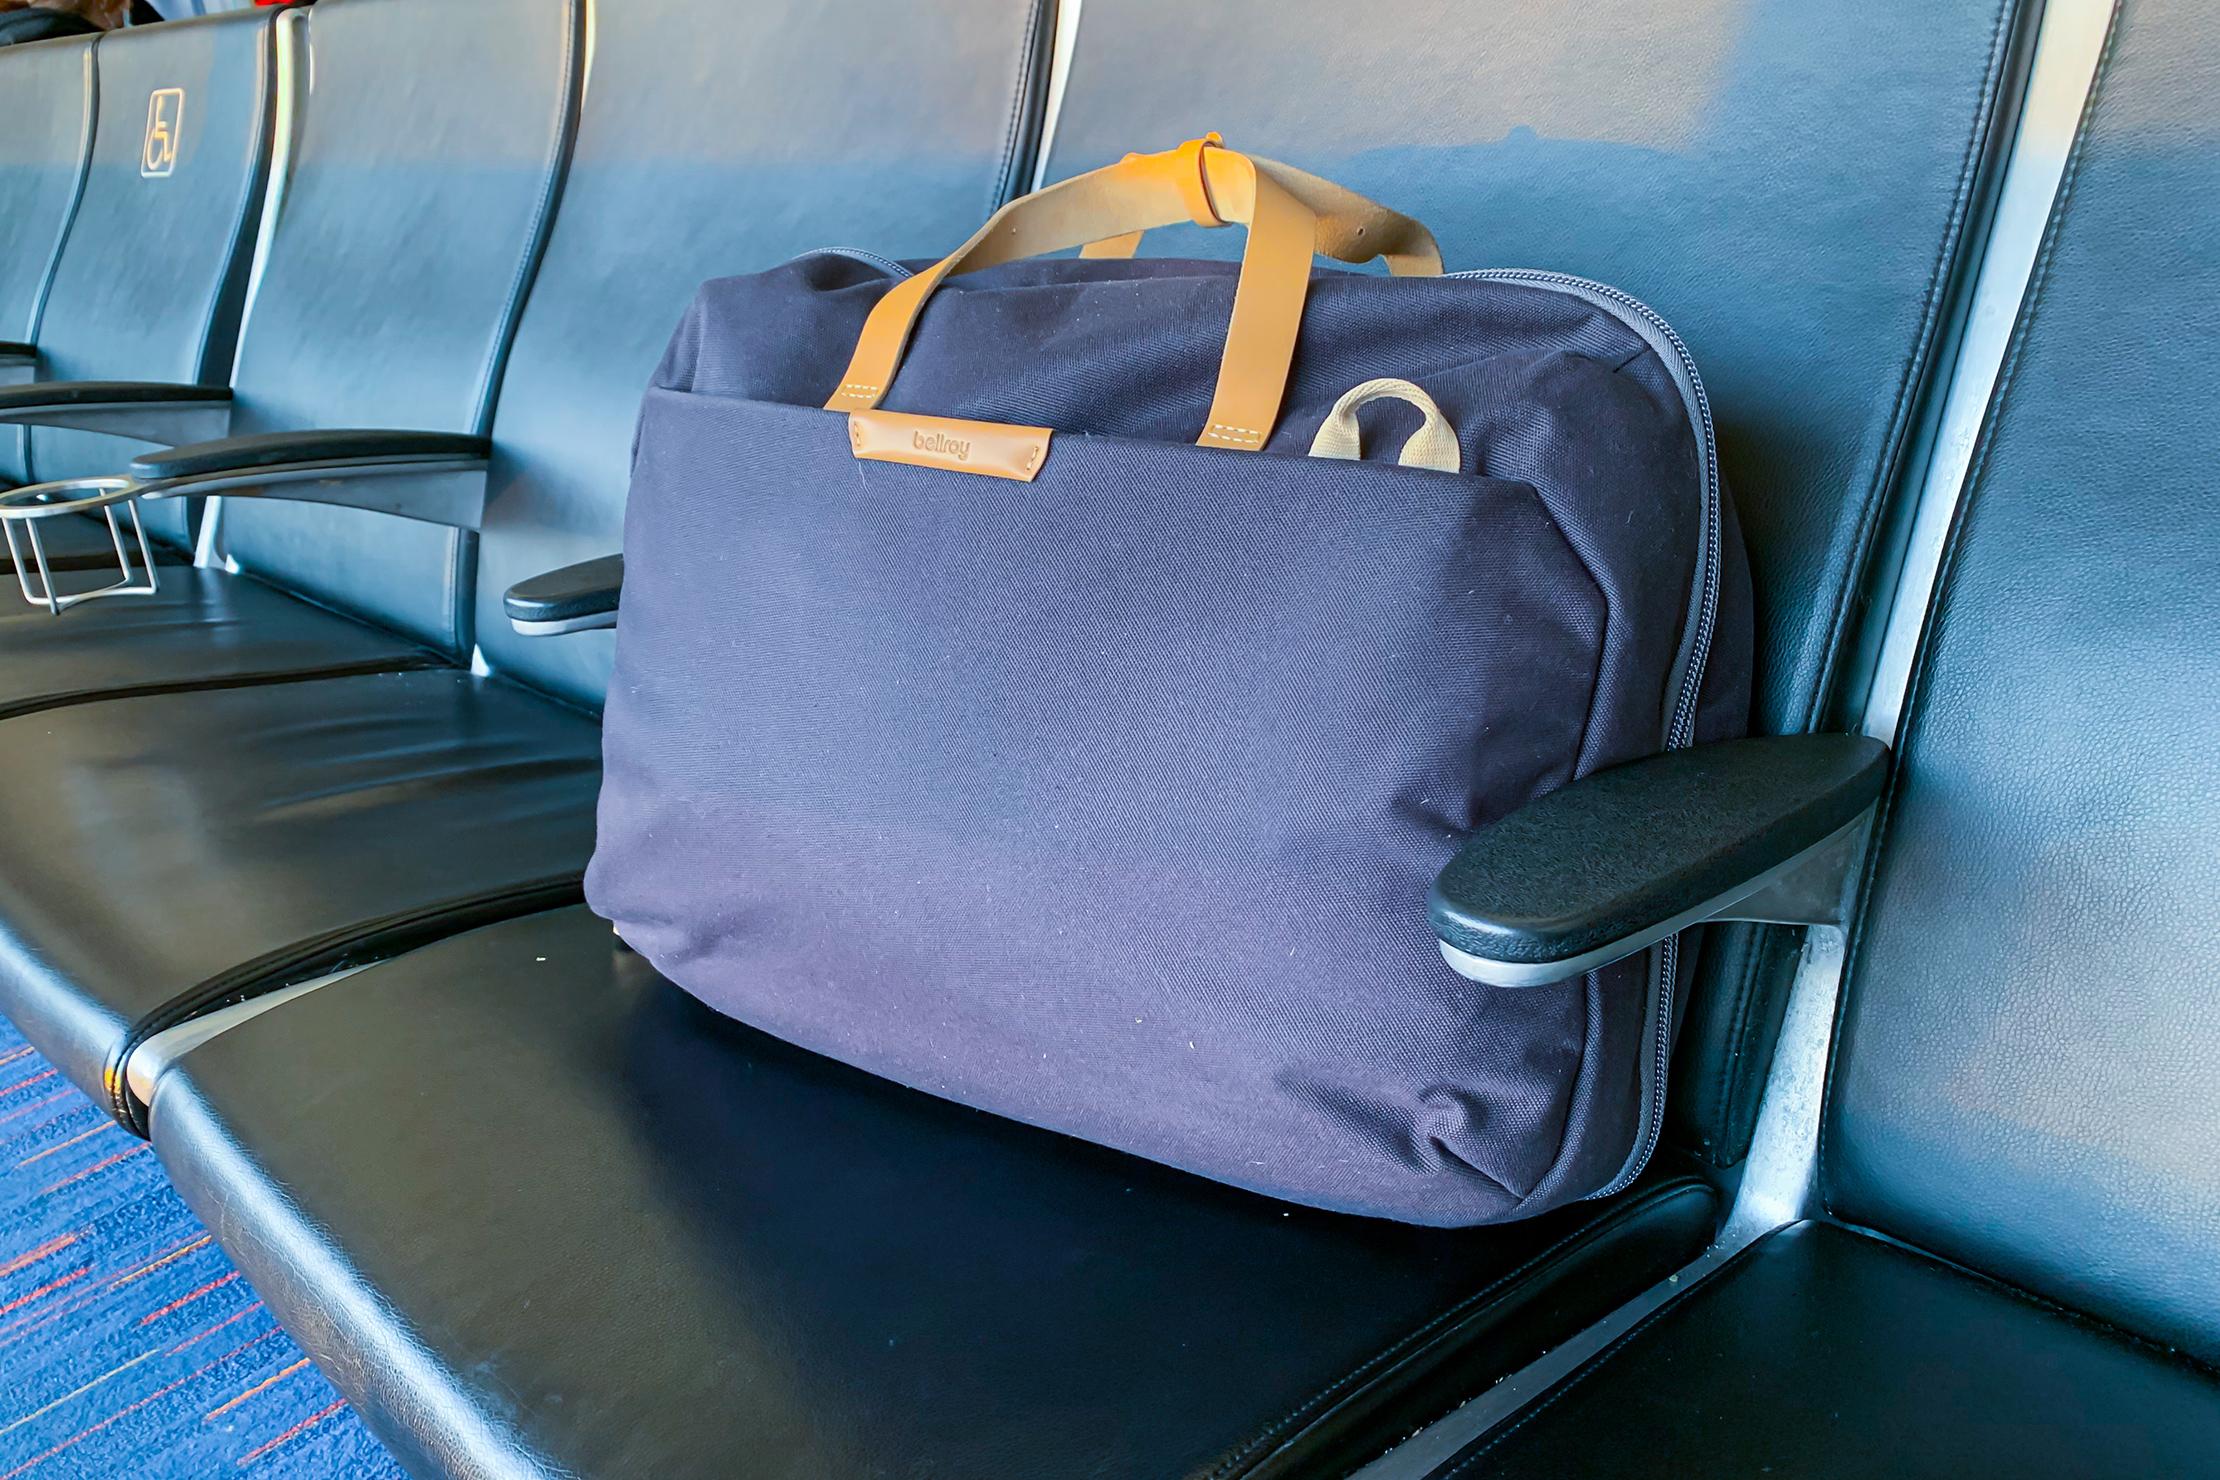 Bellroy Flight Bag At Airport